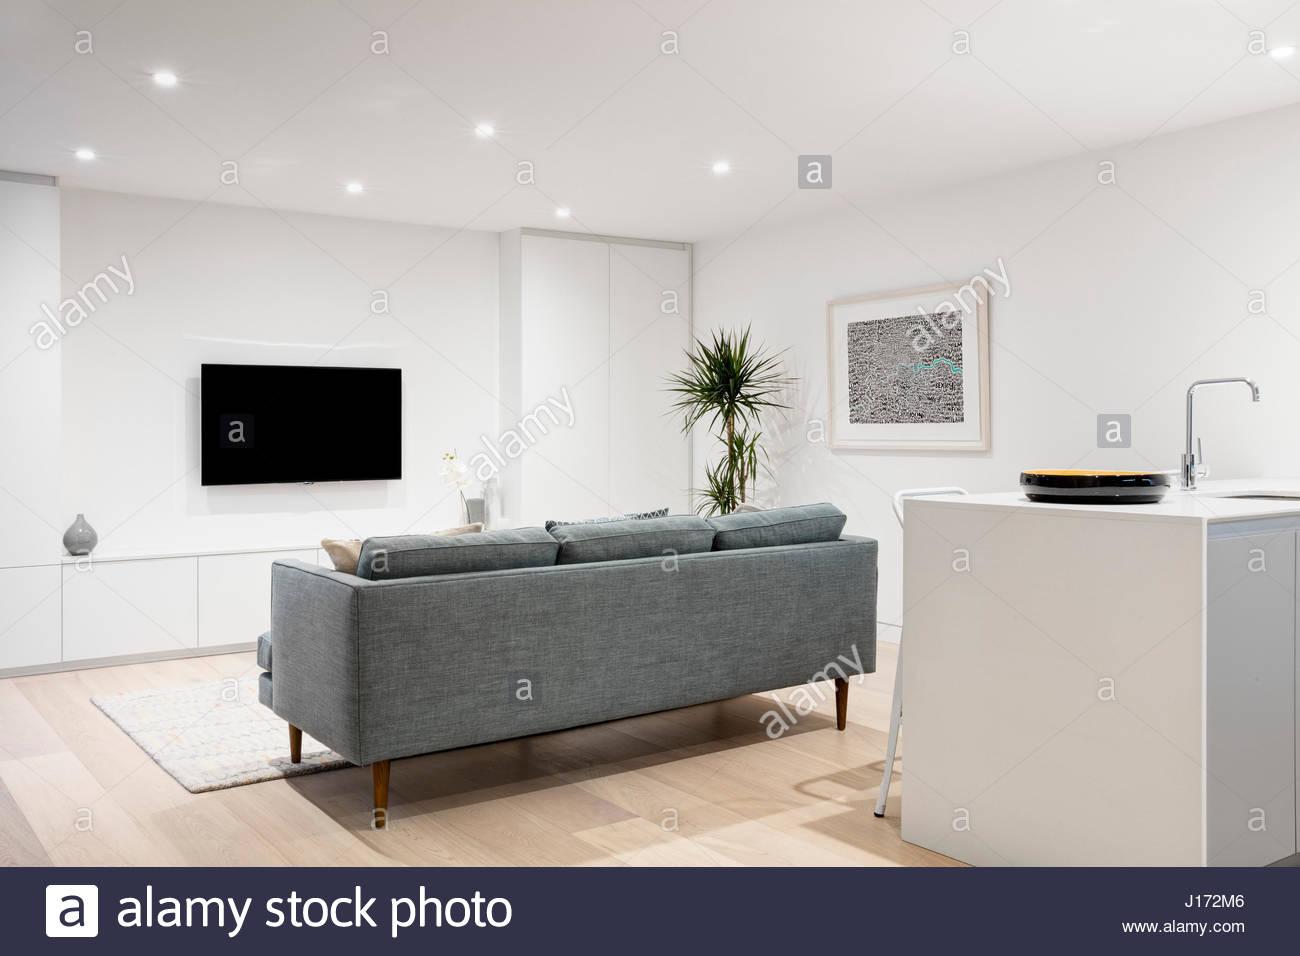 Minimal Living Room Architects Stock Photos & Minimal Living Room ...